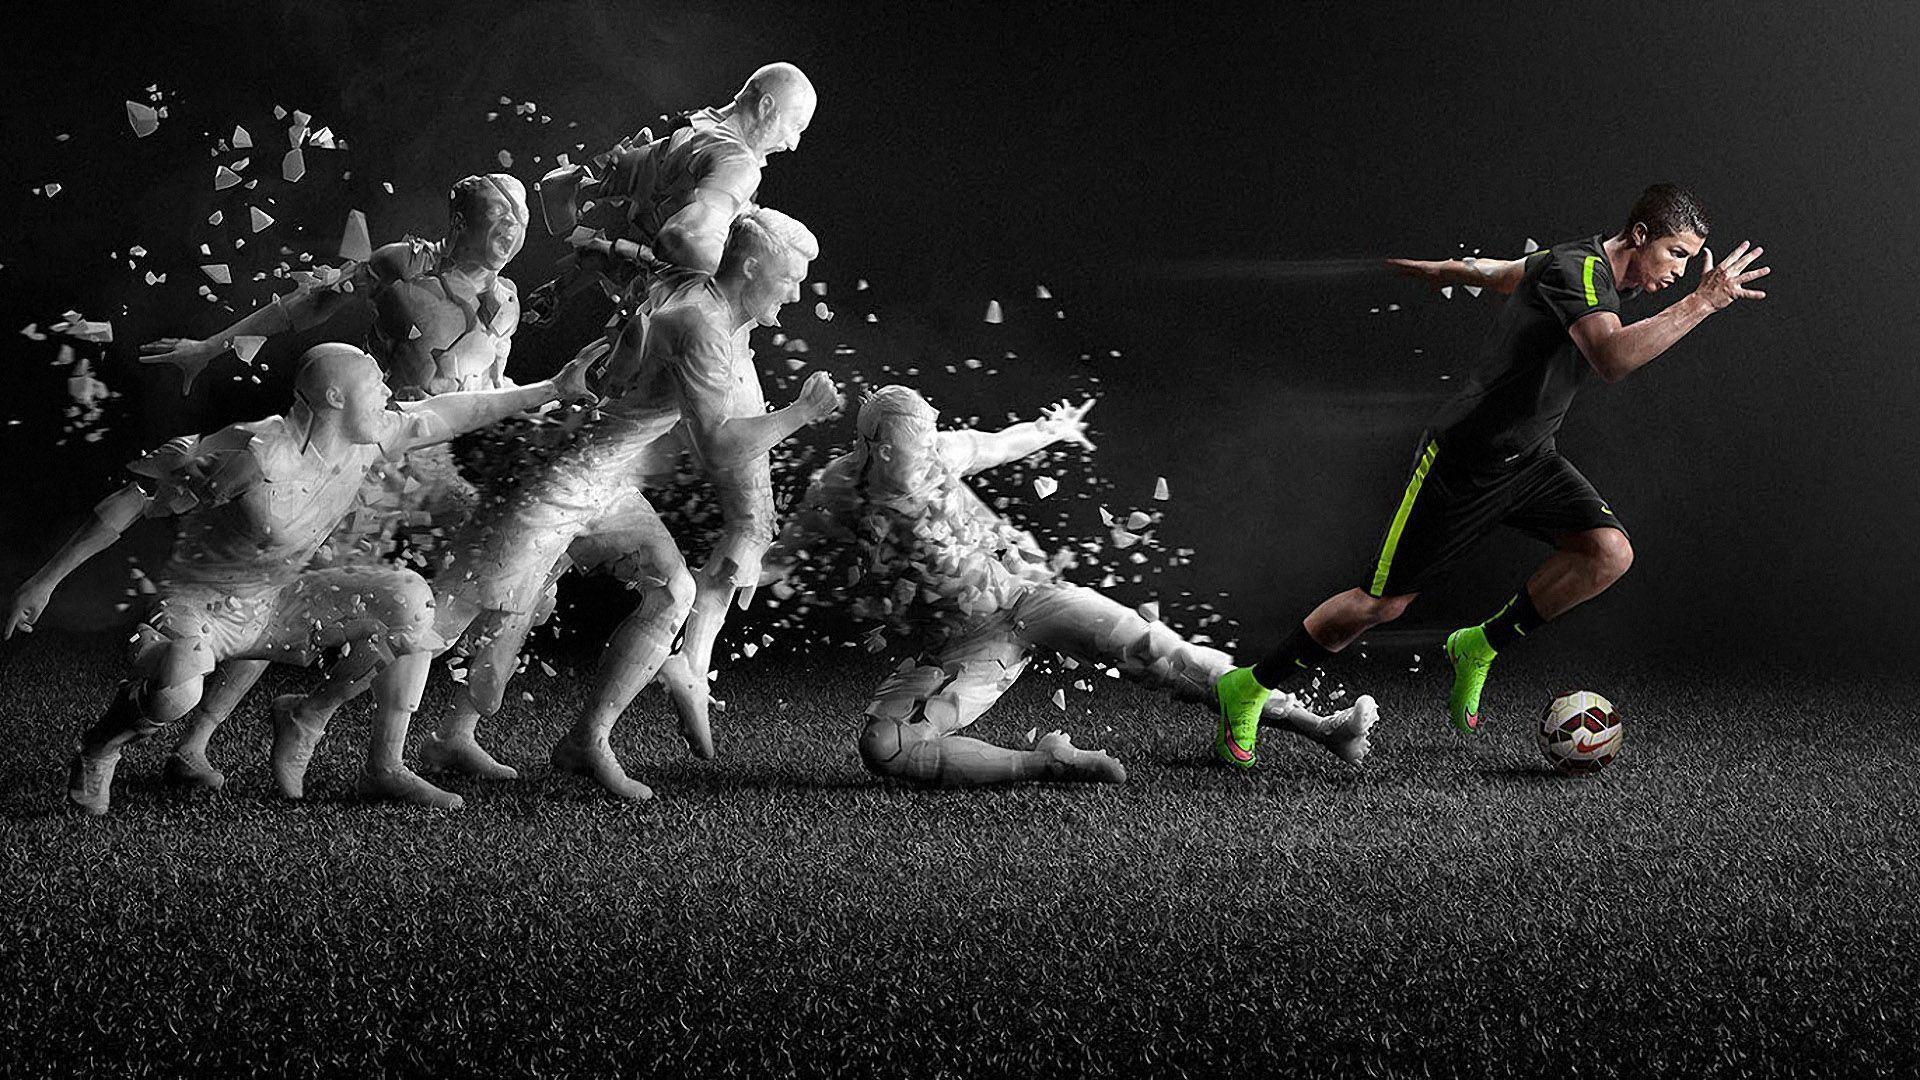 Nike Football Wallpaper 2018 Wallpapertag